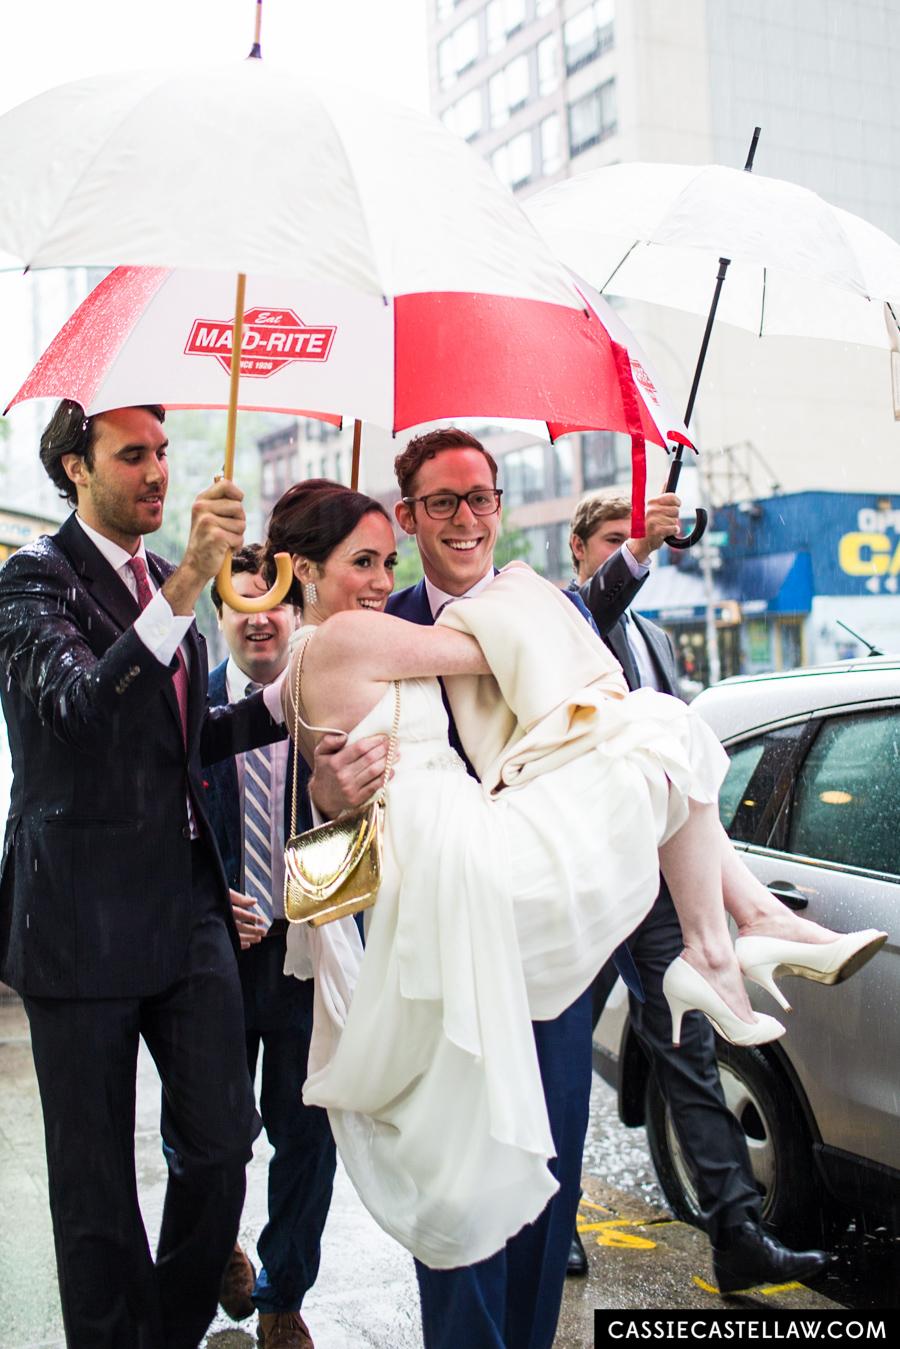 bottino-wedding-nyc-chelsea_cassiecastellaw.com-037.JPG